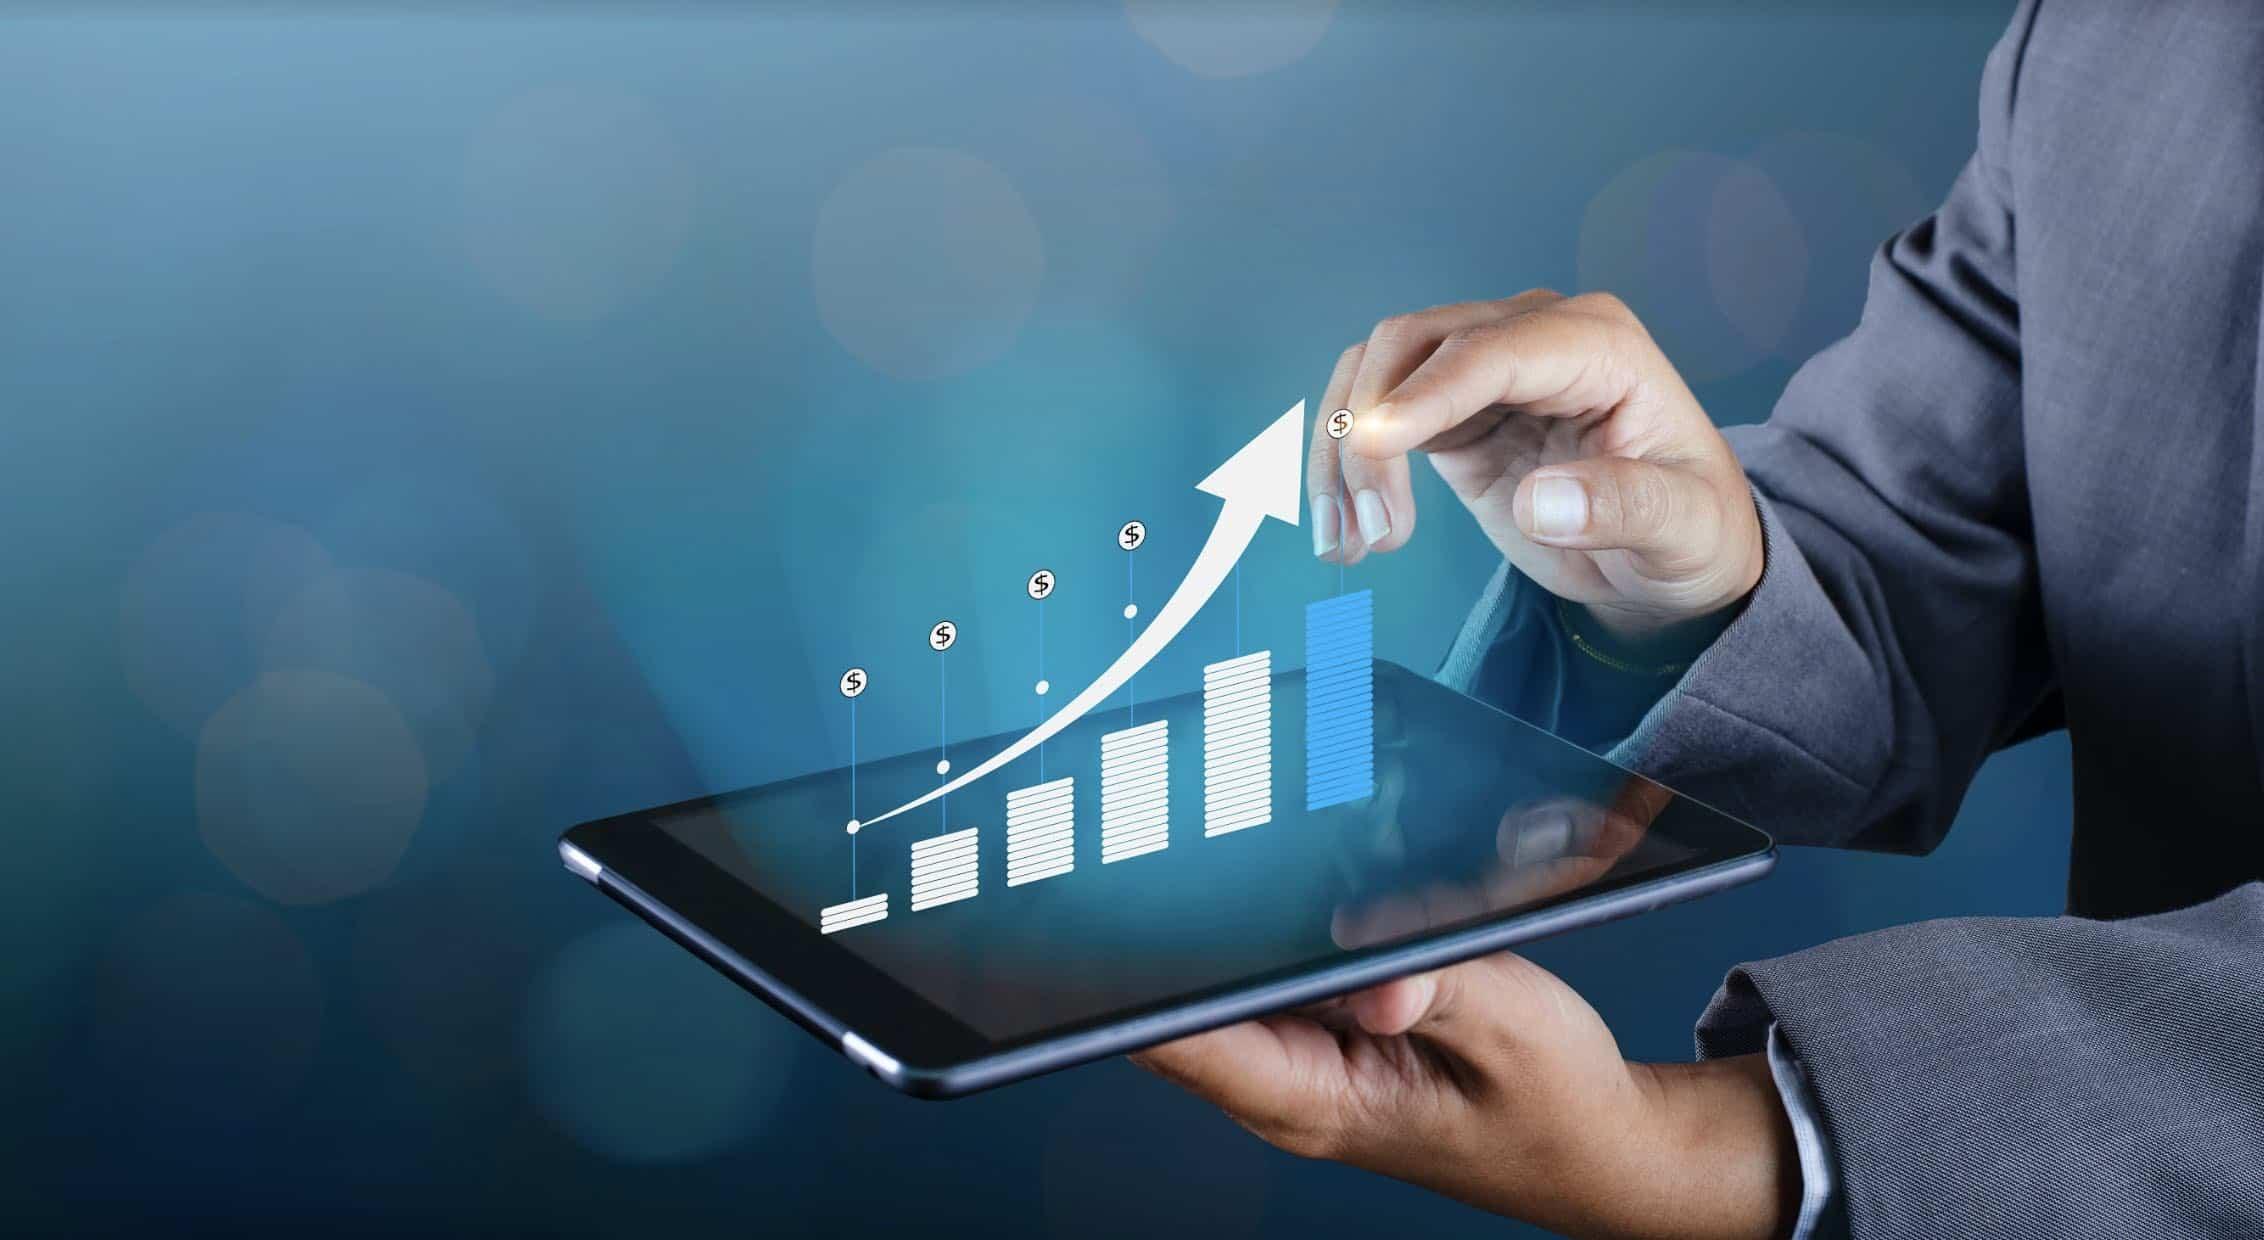 mobile-financial-analytics.jpg